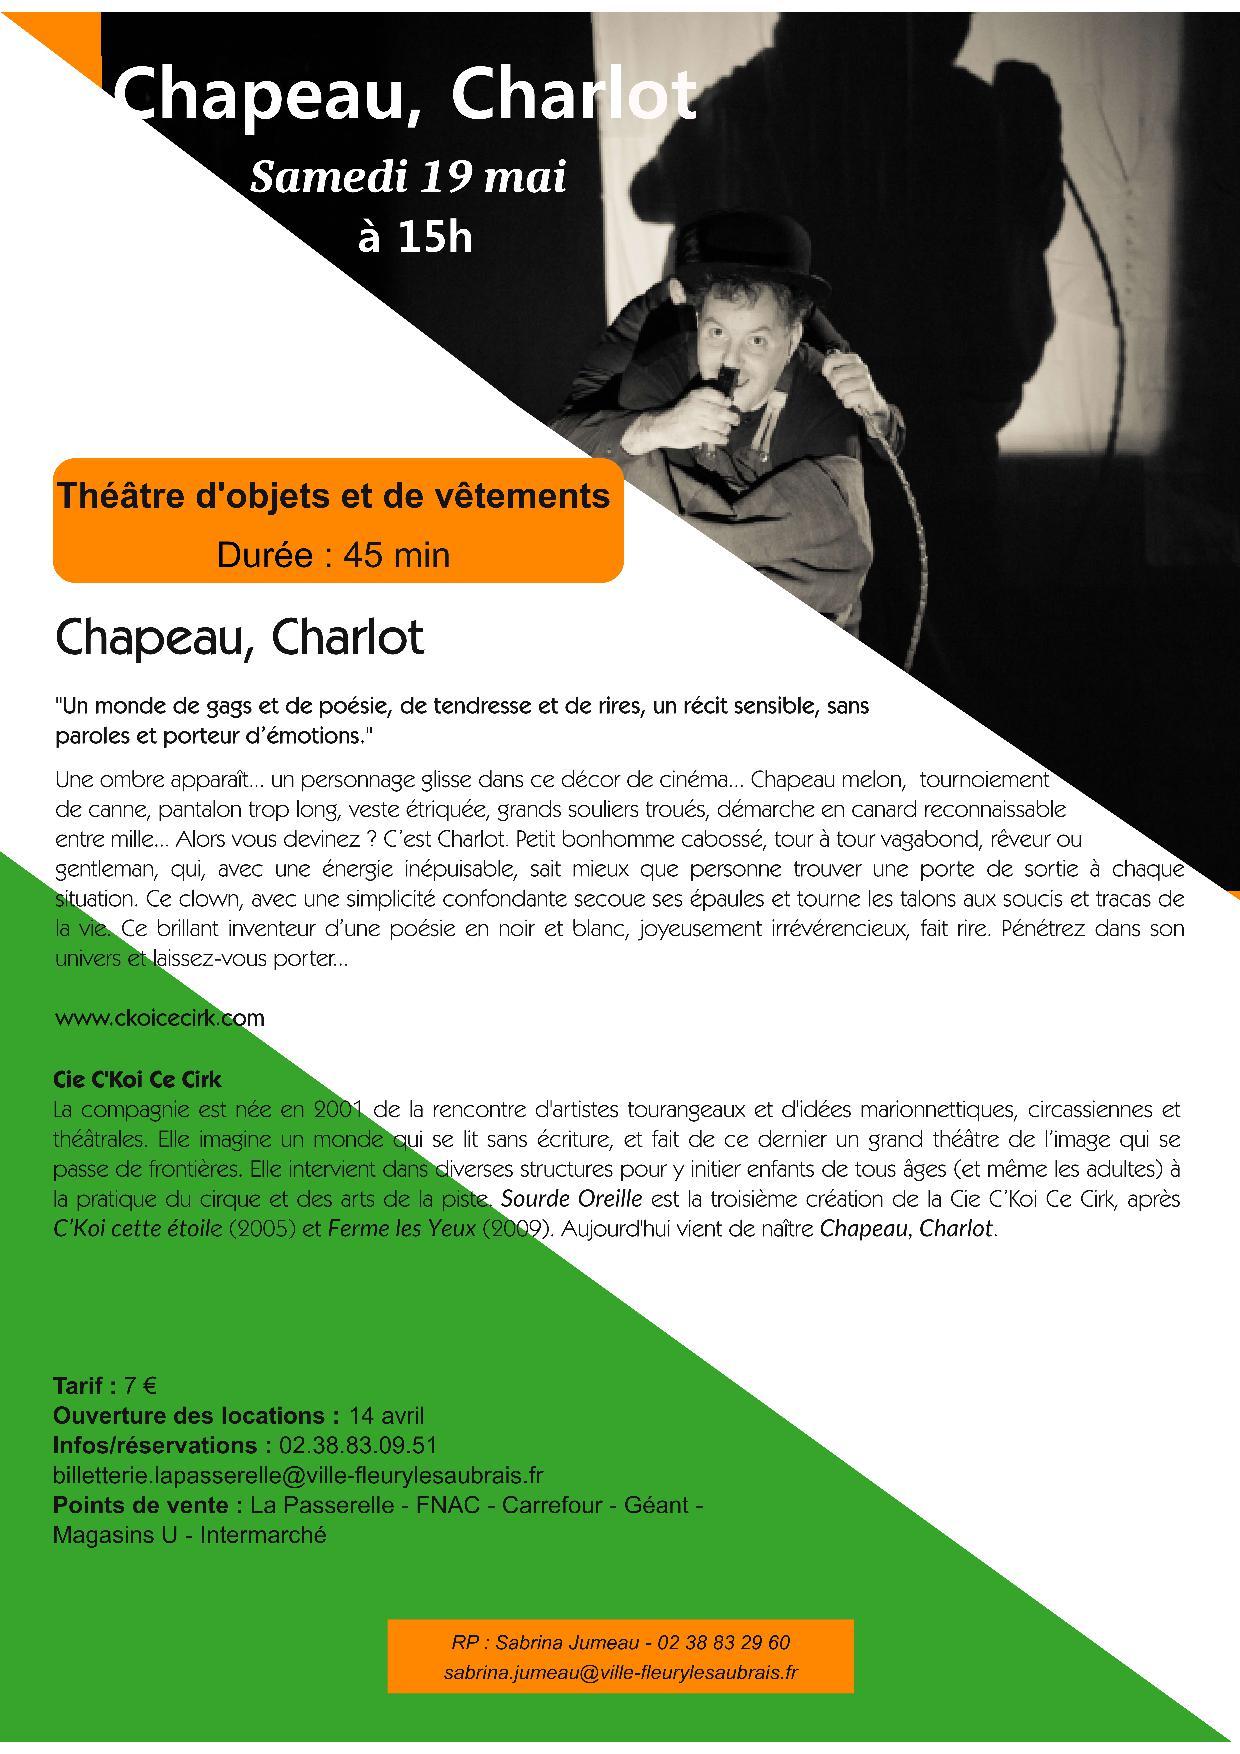 C_Users_Jose_AppData_Local_Temp_Chapeau Charlot.jpg